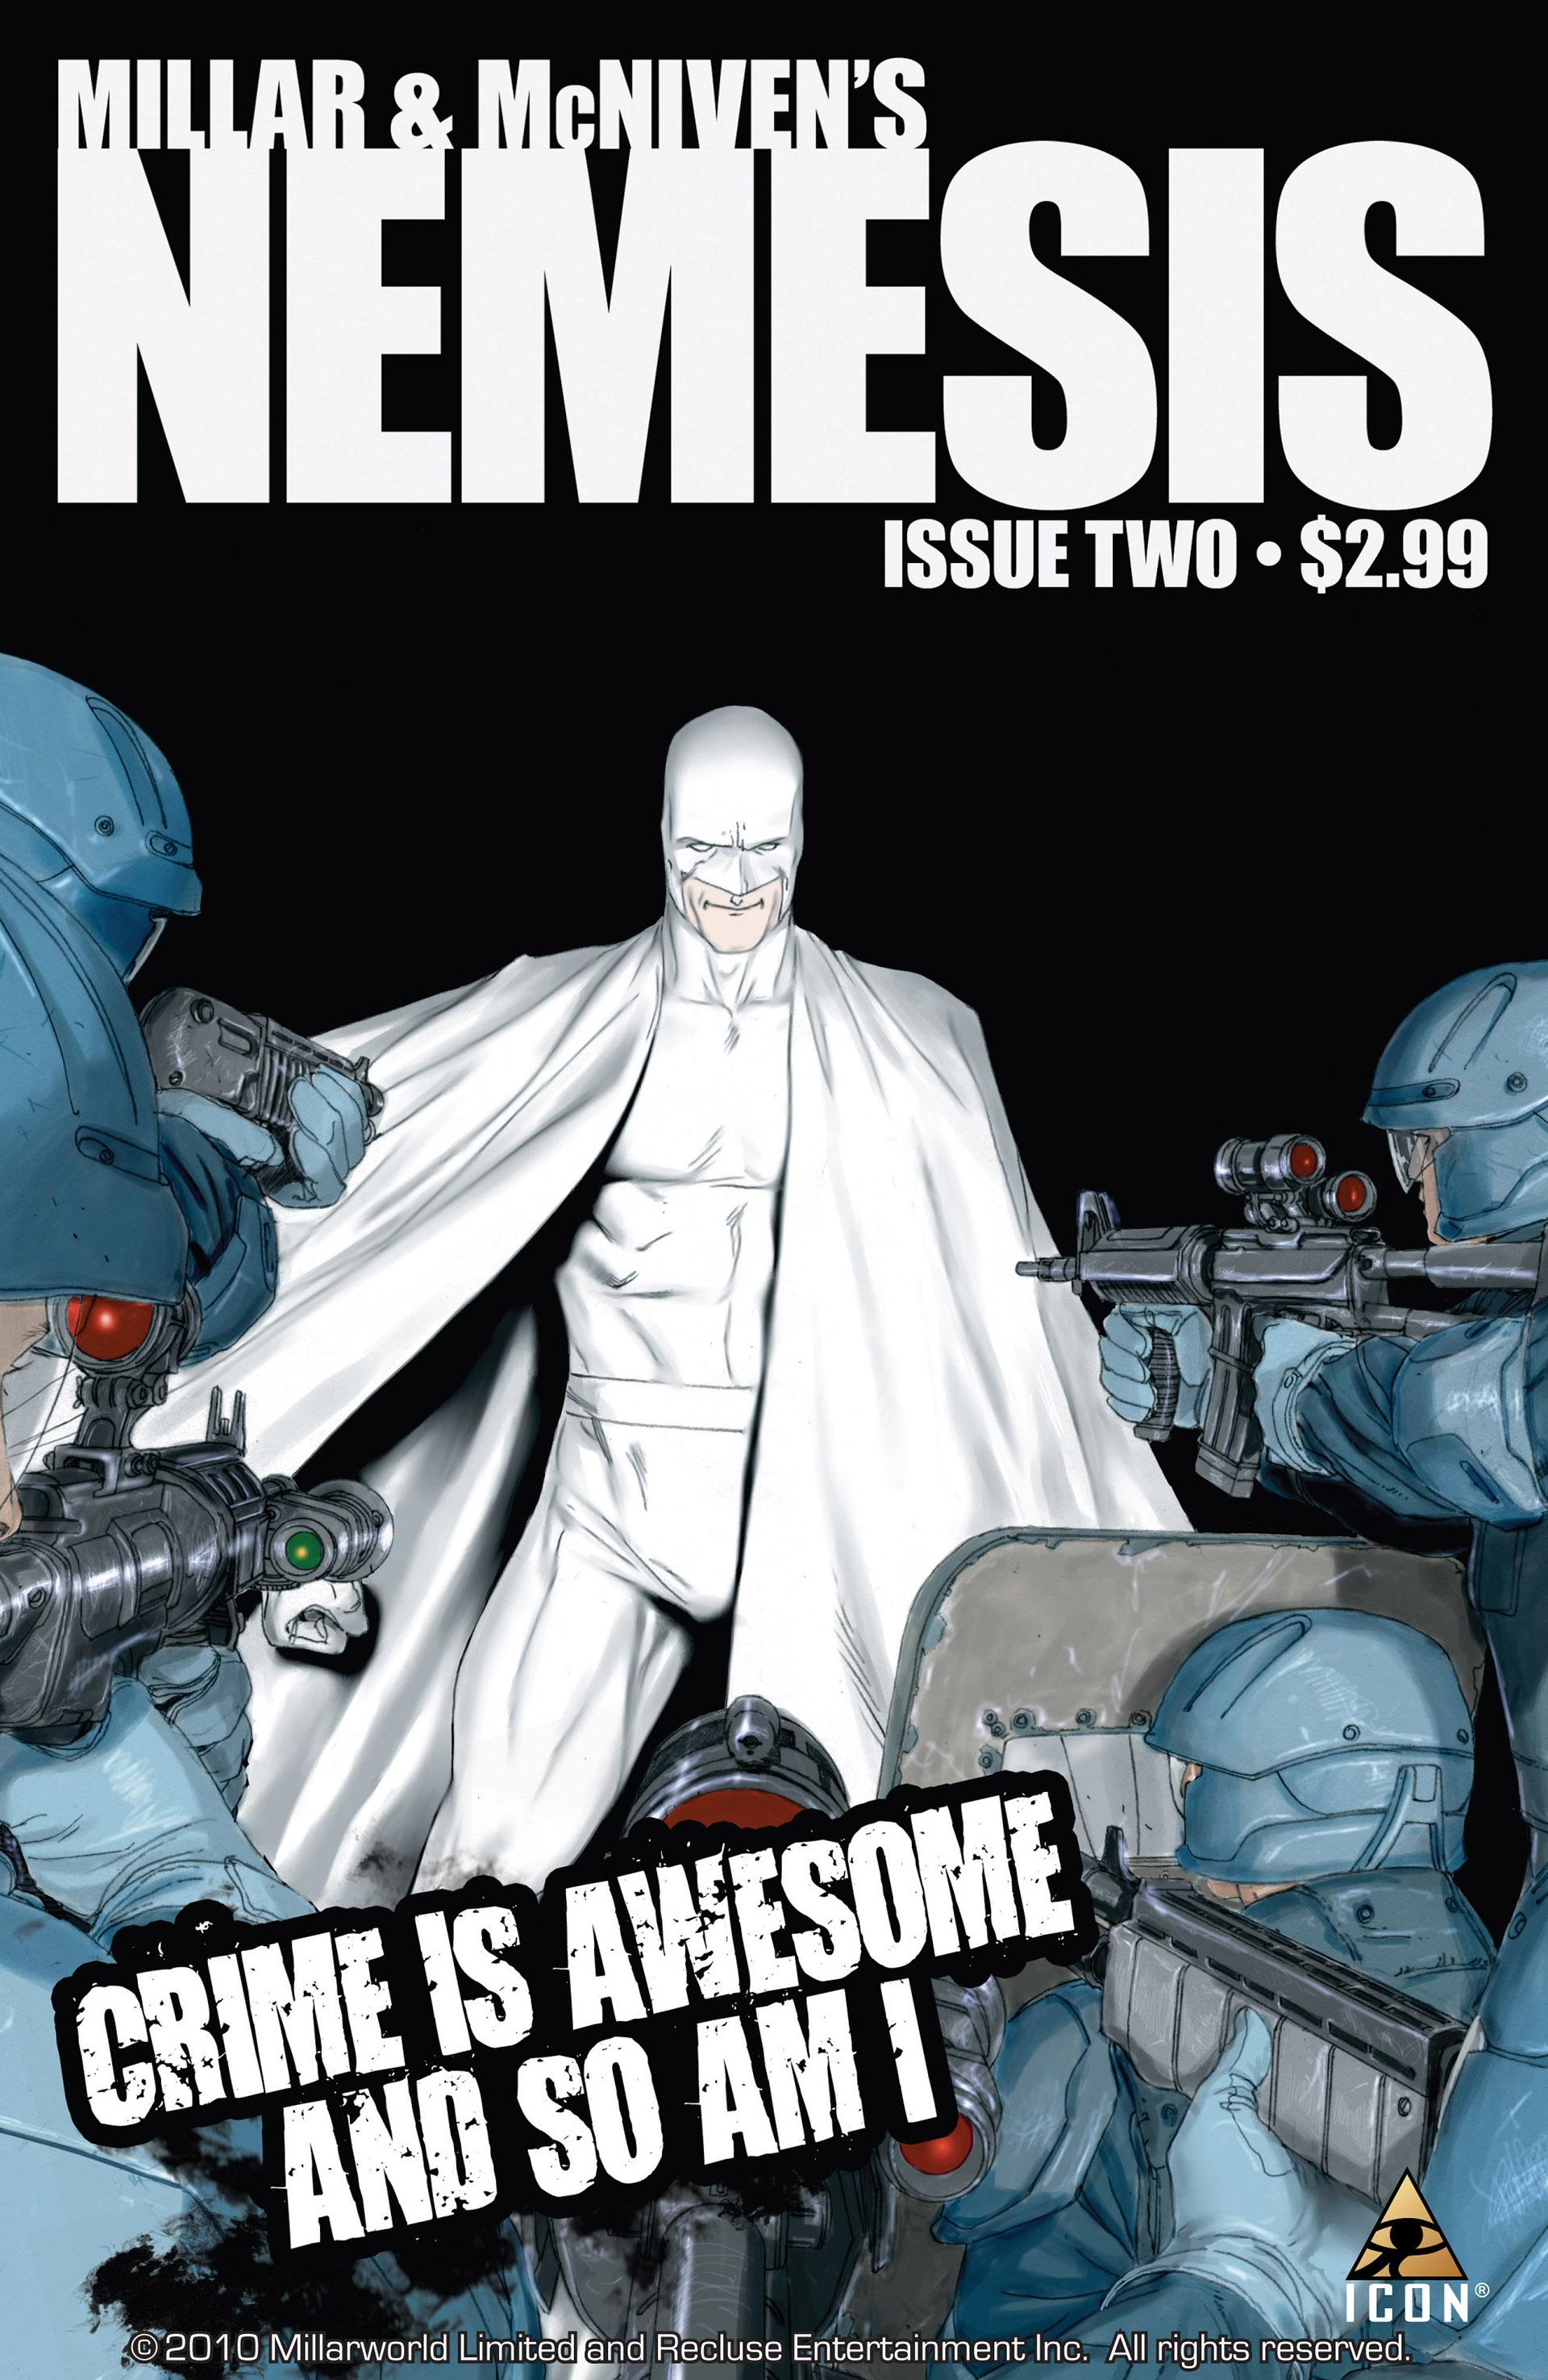 Read online Millar & McNiven's Nemesis comic -  Issue #2 - 1